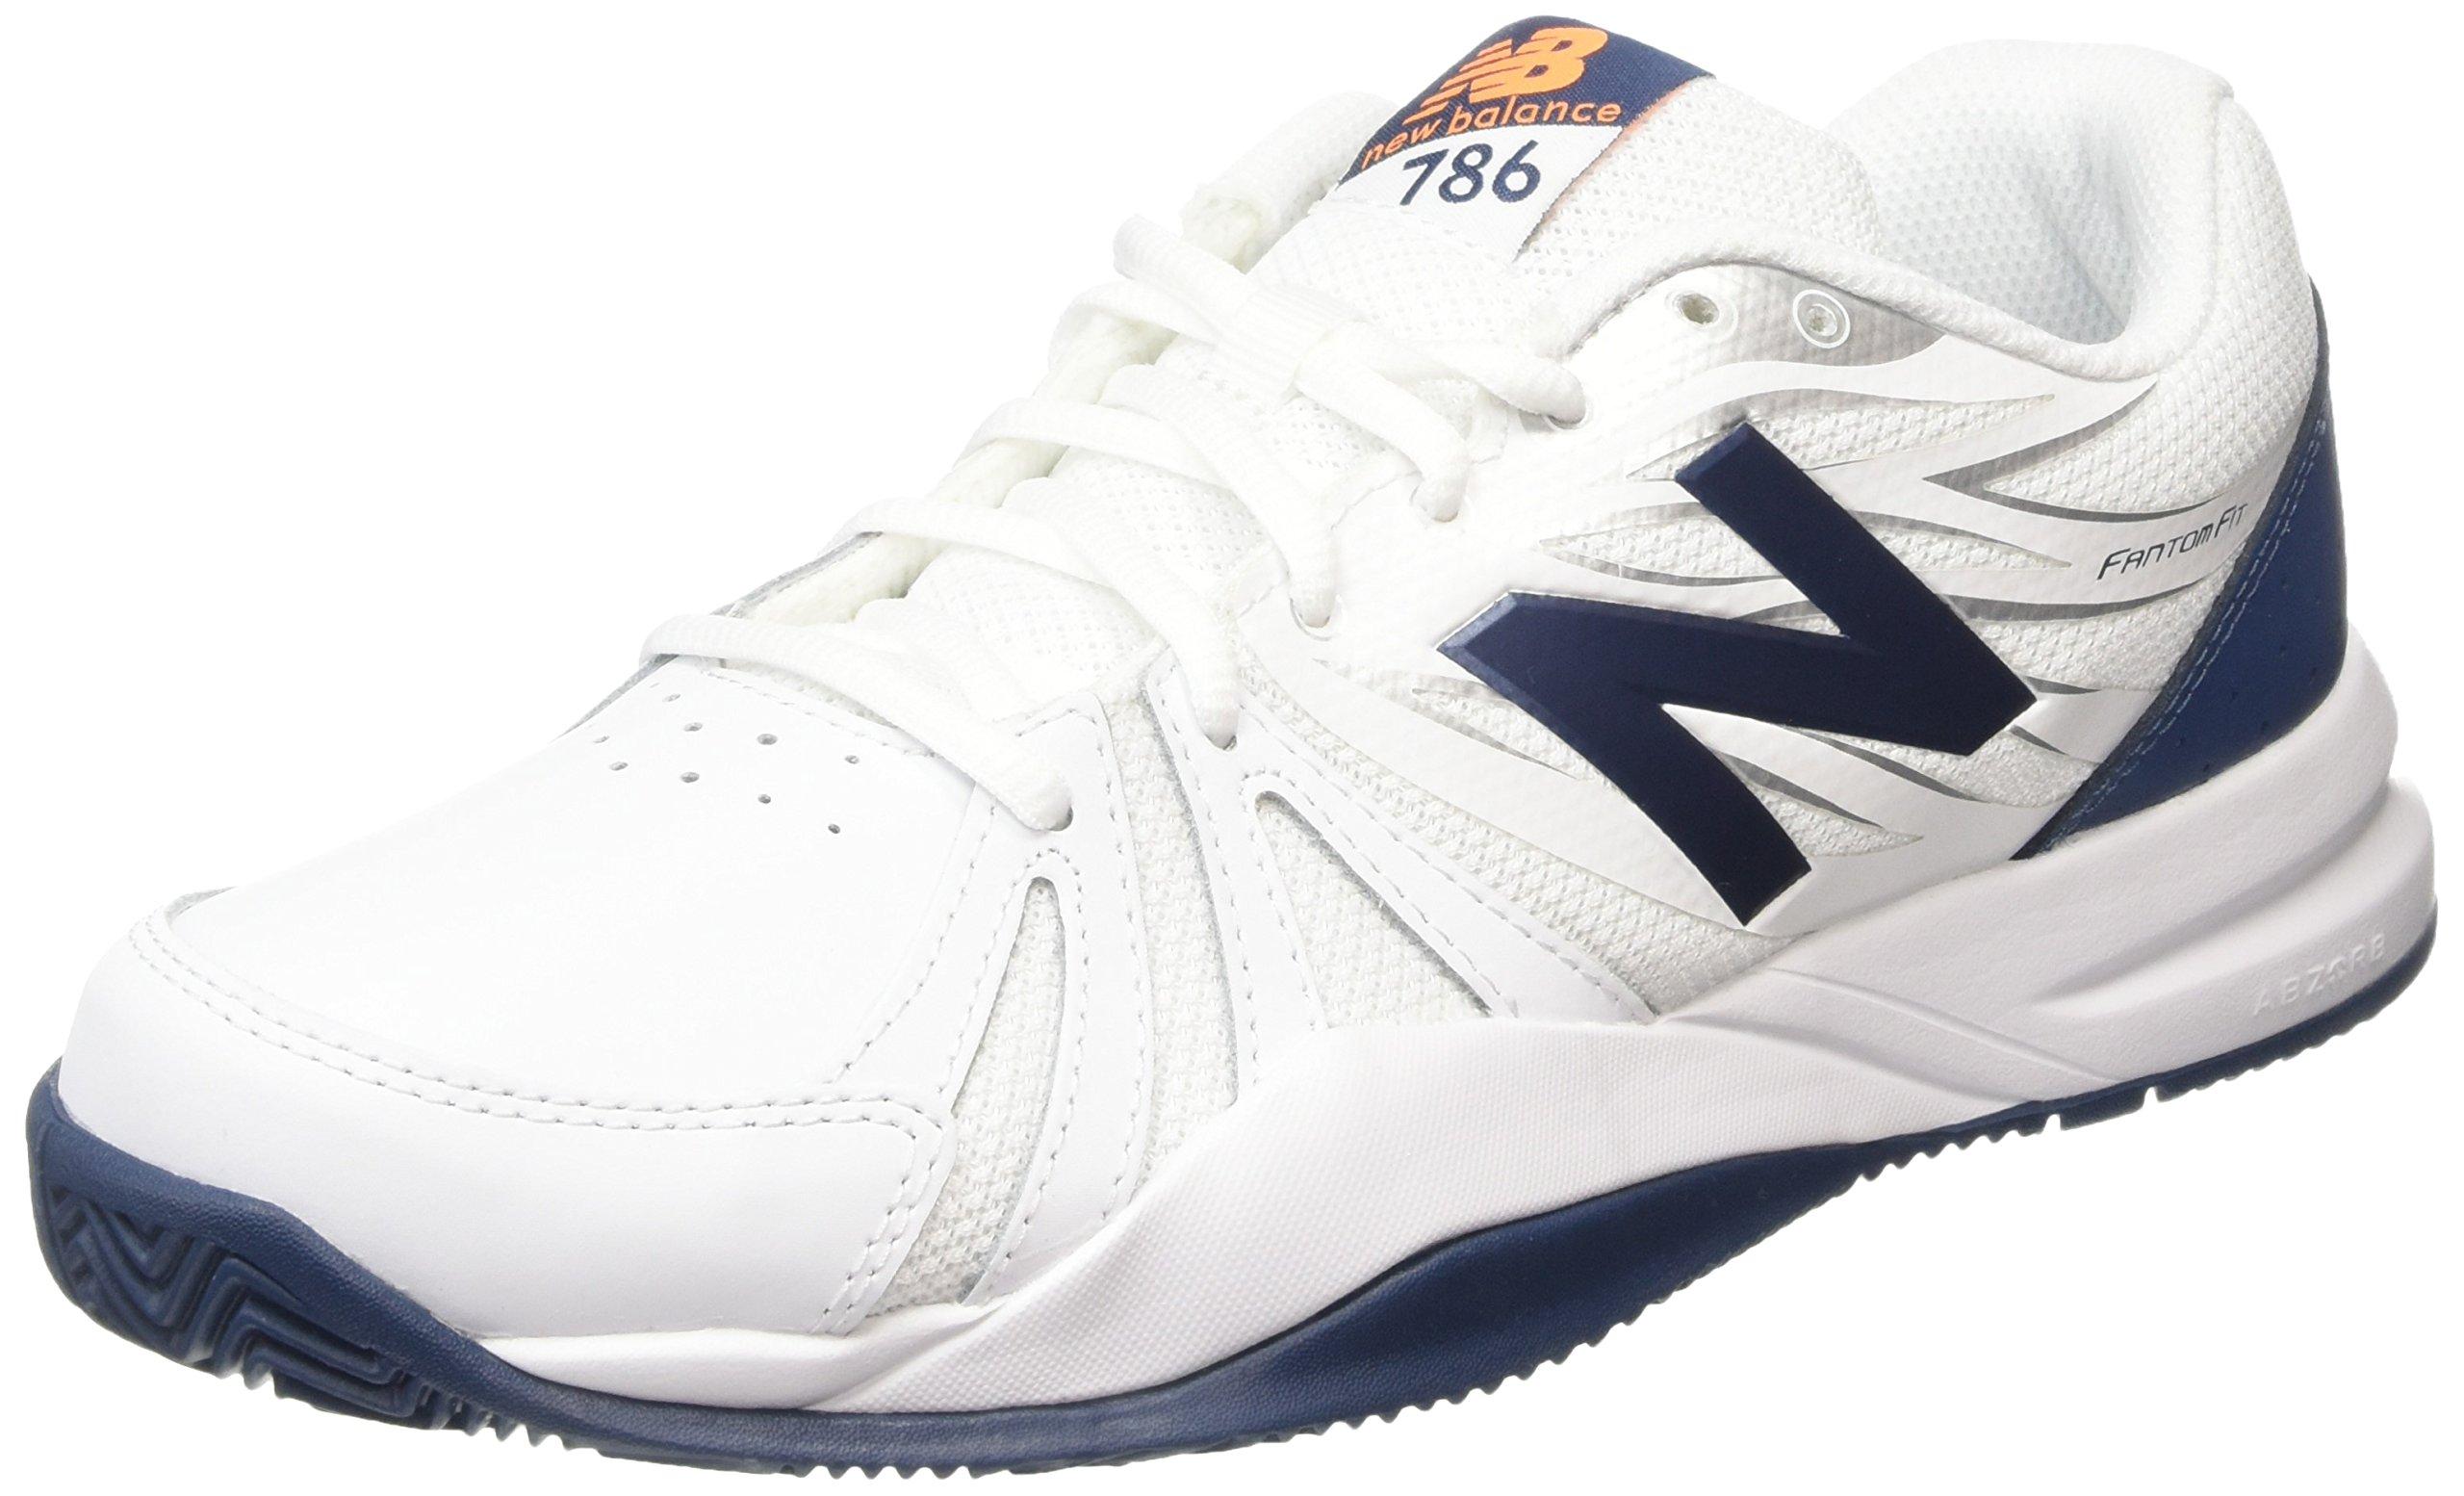 New Balance Men's Cushioning Tennis Shoe, White/Blue, 15 D US